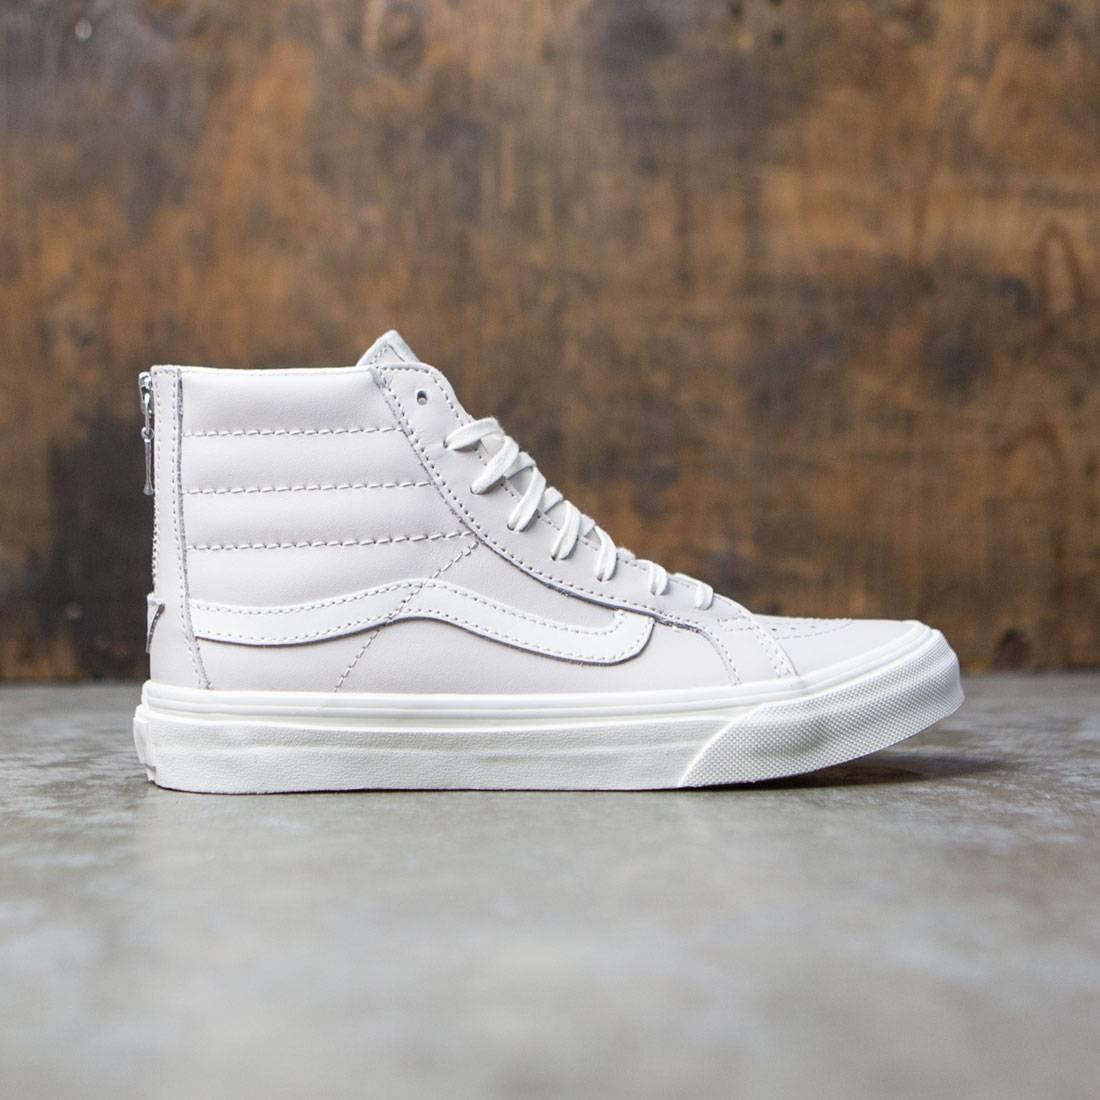 c60f2e3b3a5e5 Vans Women Sk8-Hi Slim Zip - Leather white wind blanc de blanc